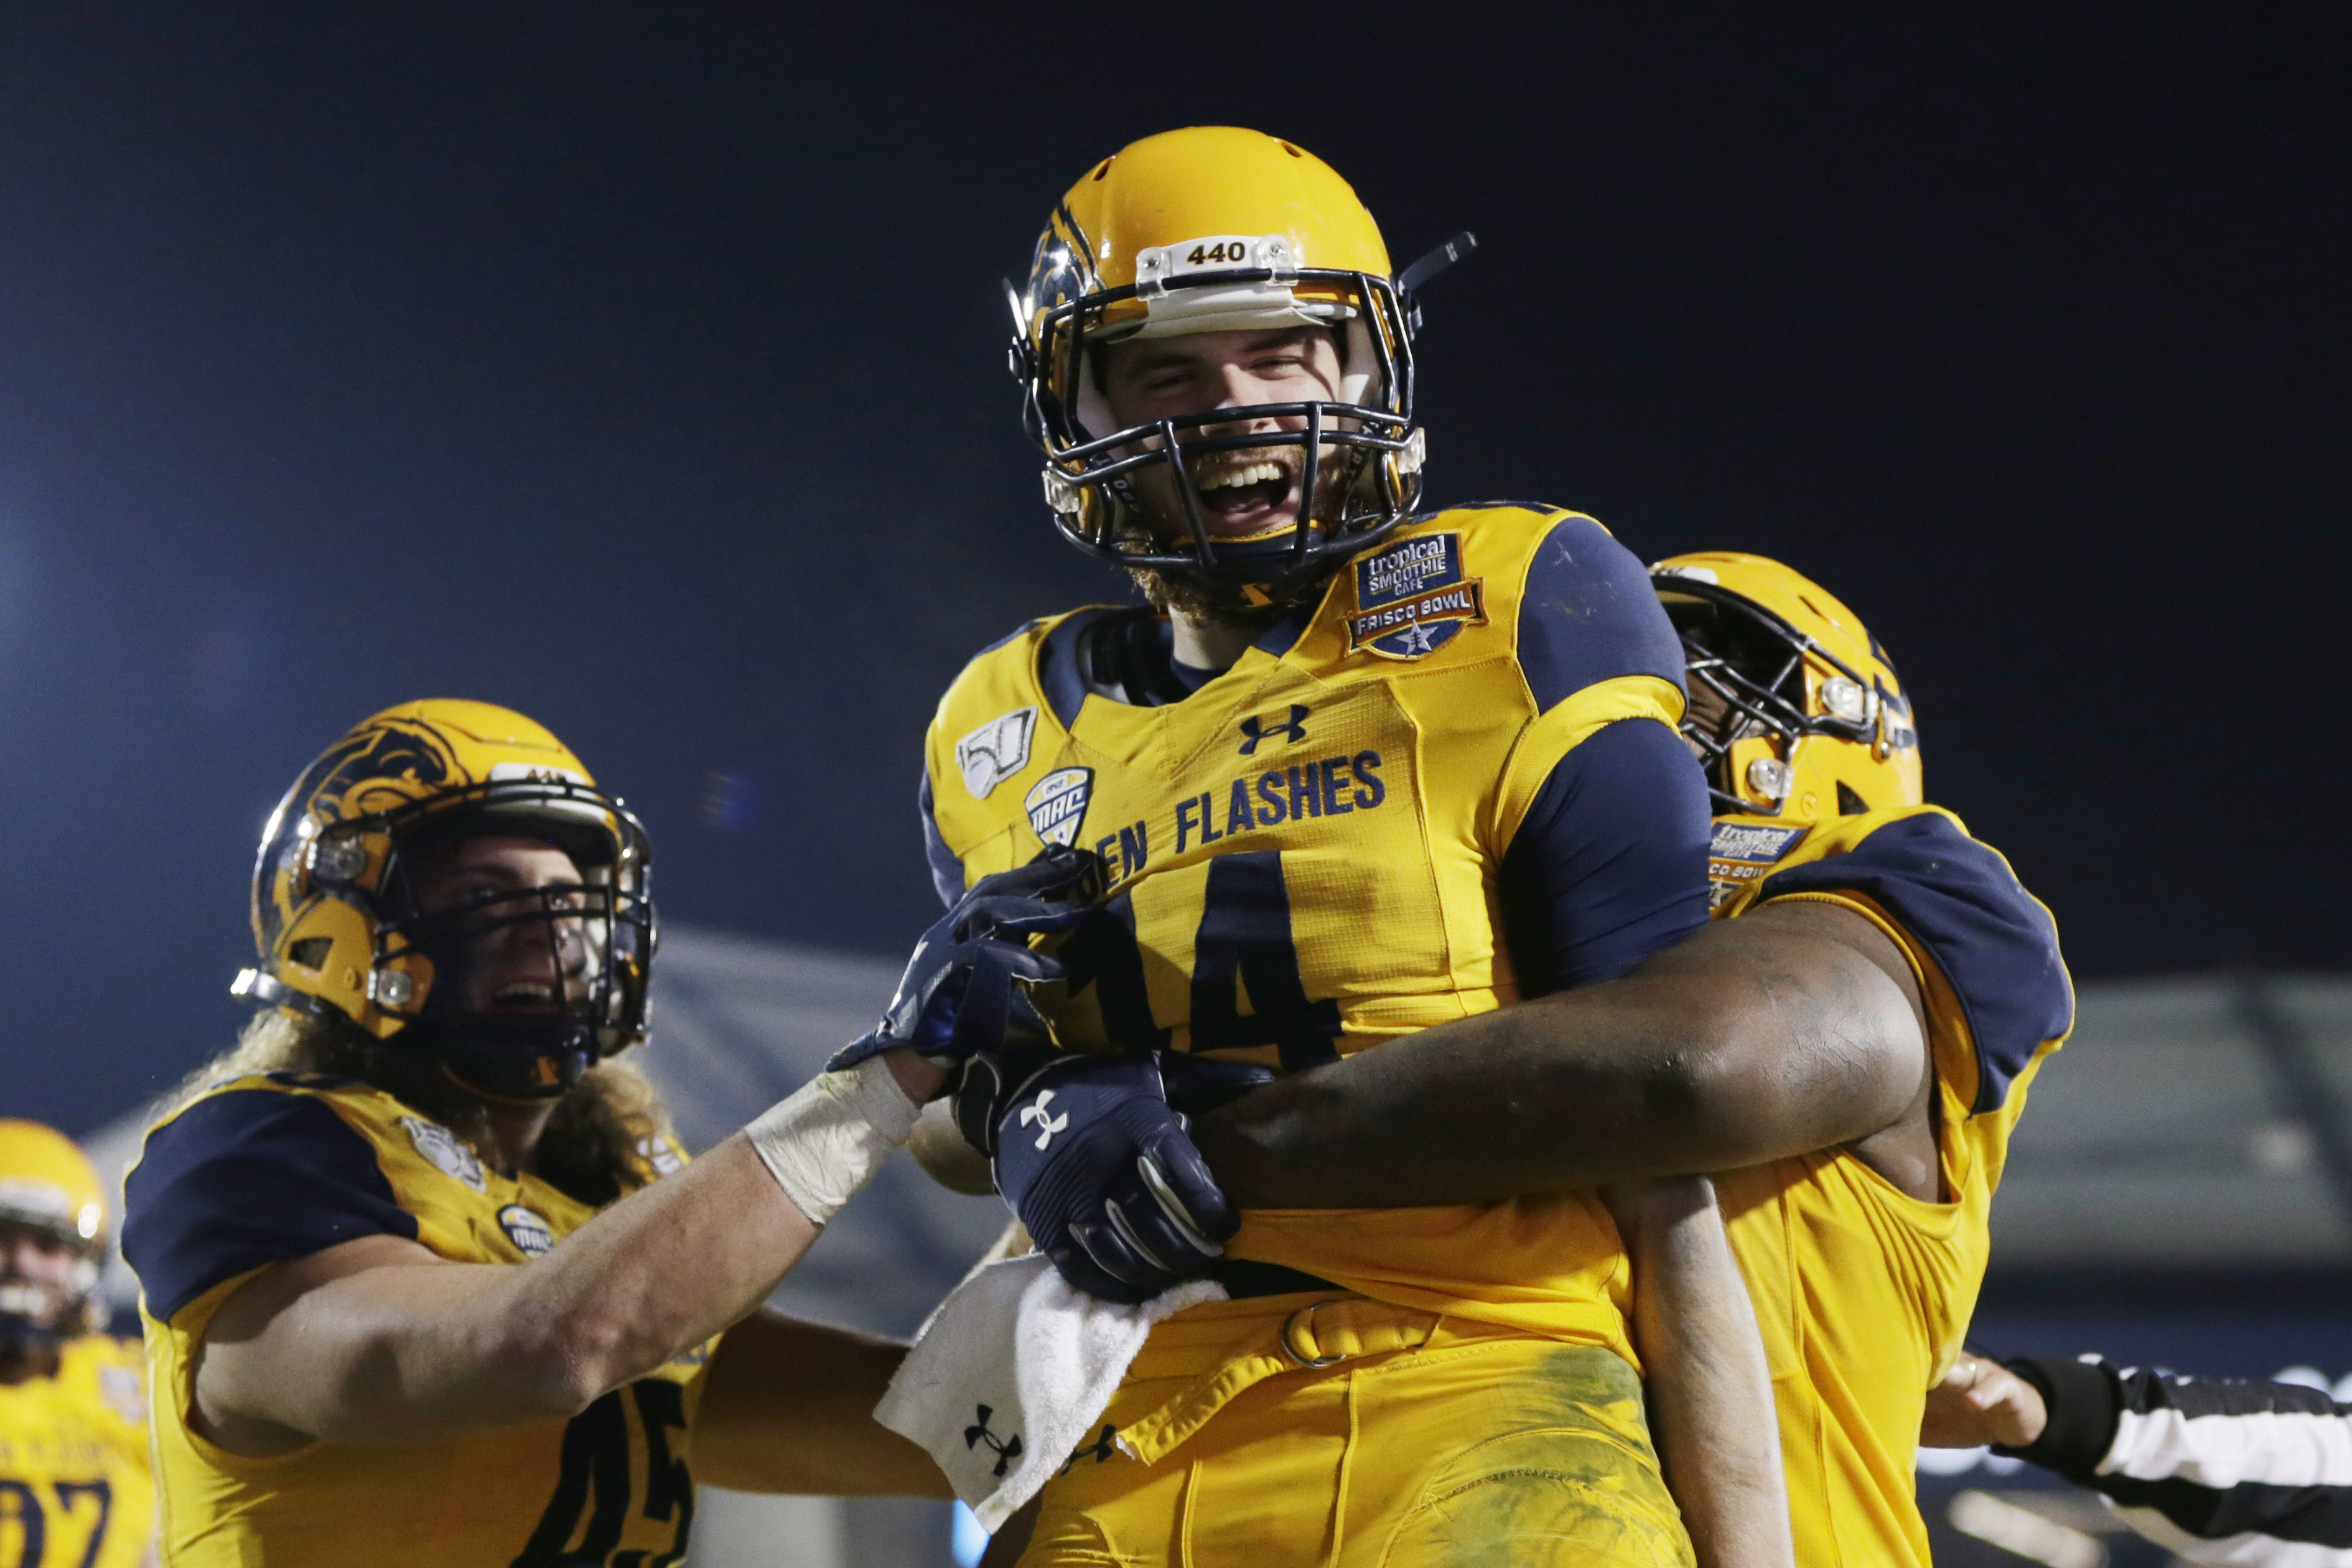 NCAA Football: Frisco Bowl-Utah State vs Kent State